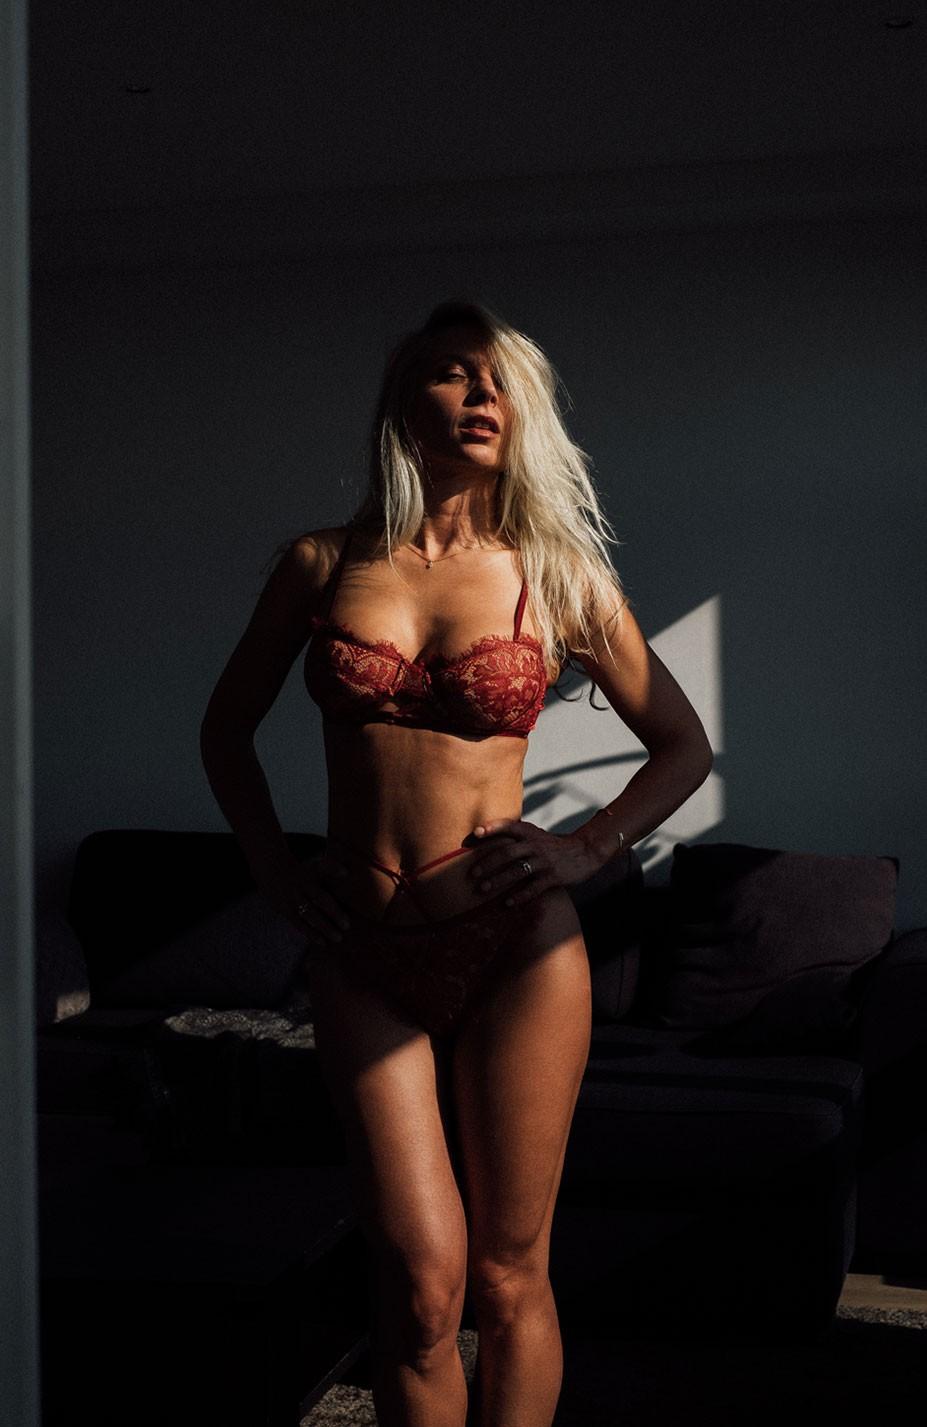 Valerie S_Fantine in sexual lingerie by Julien LRVR